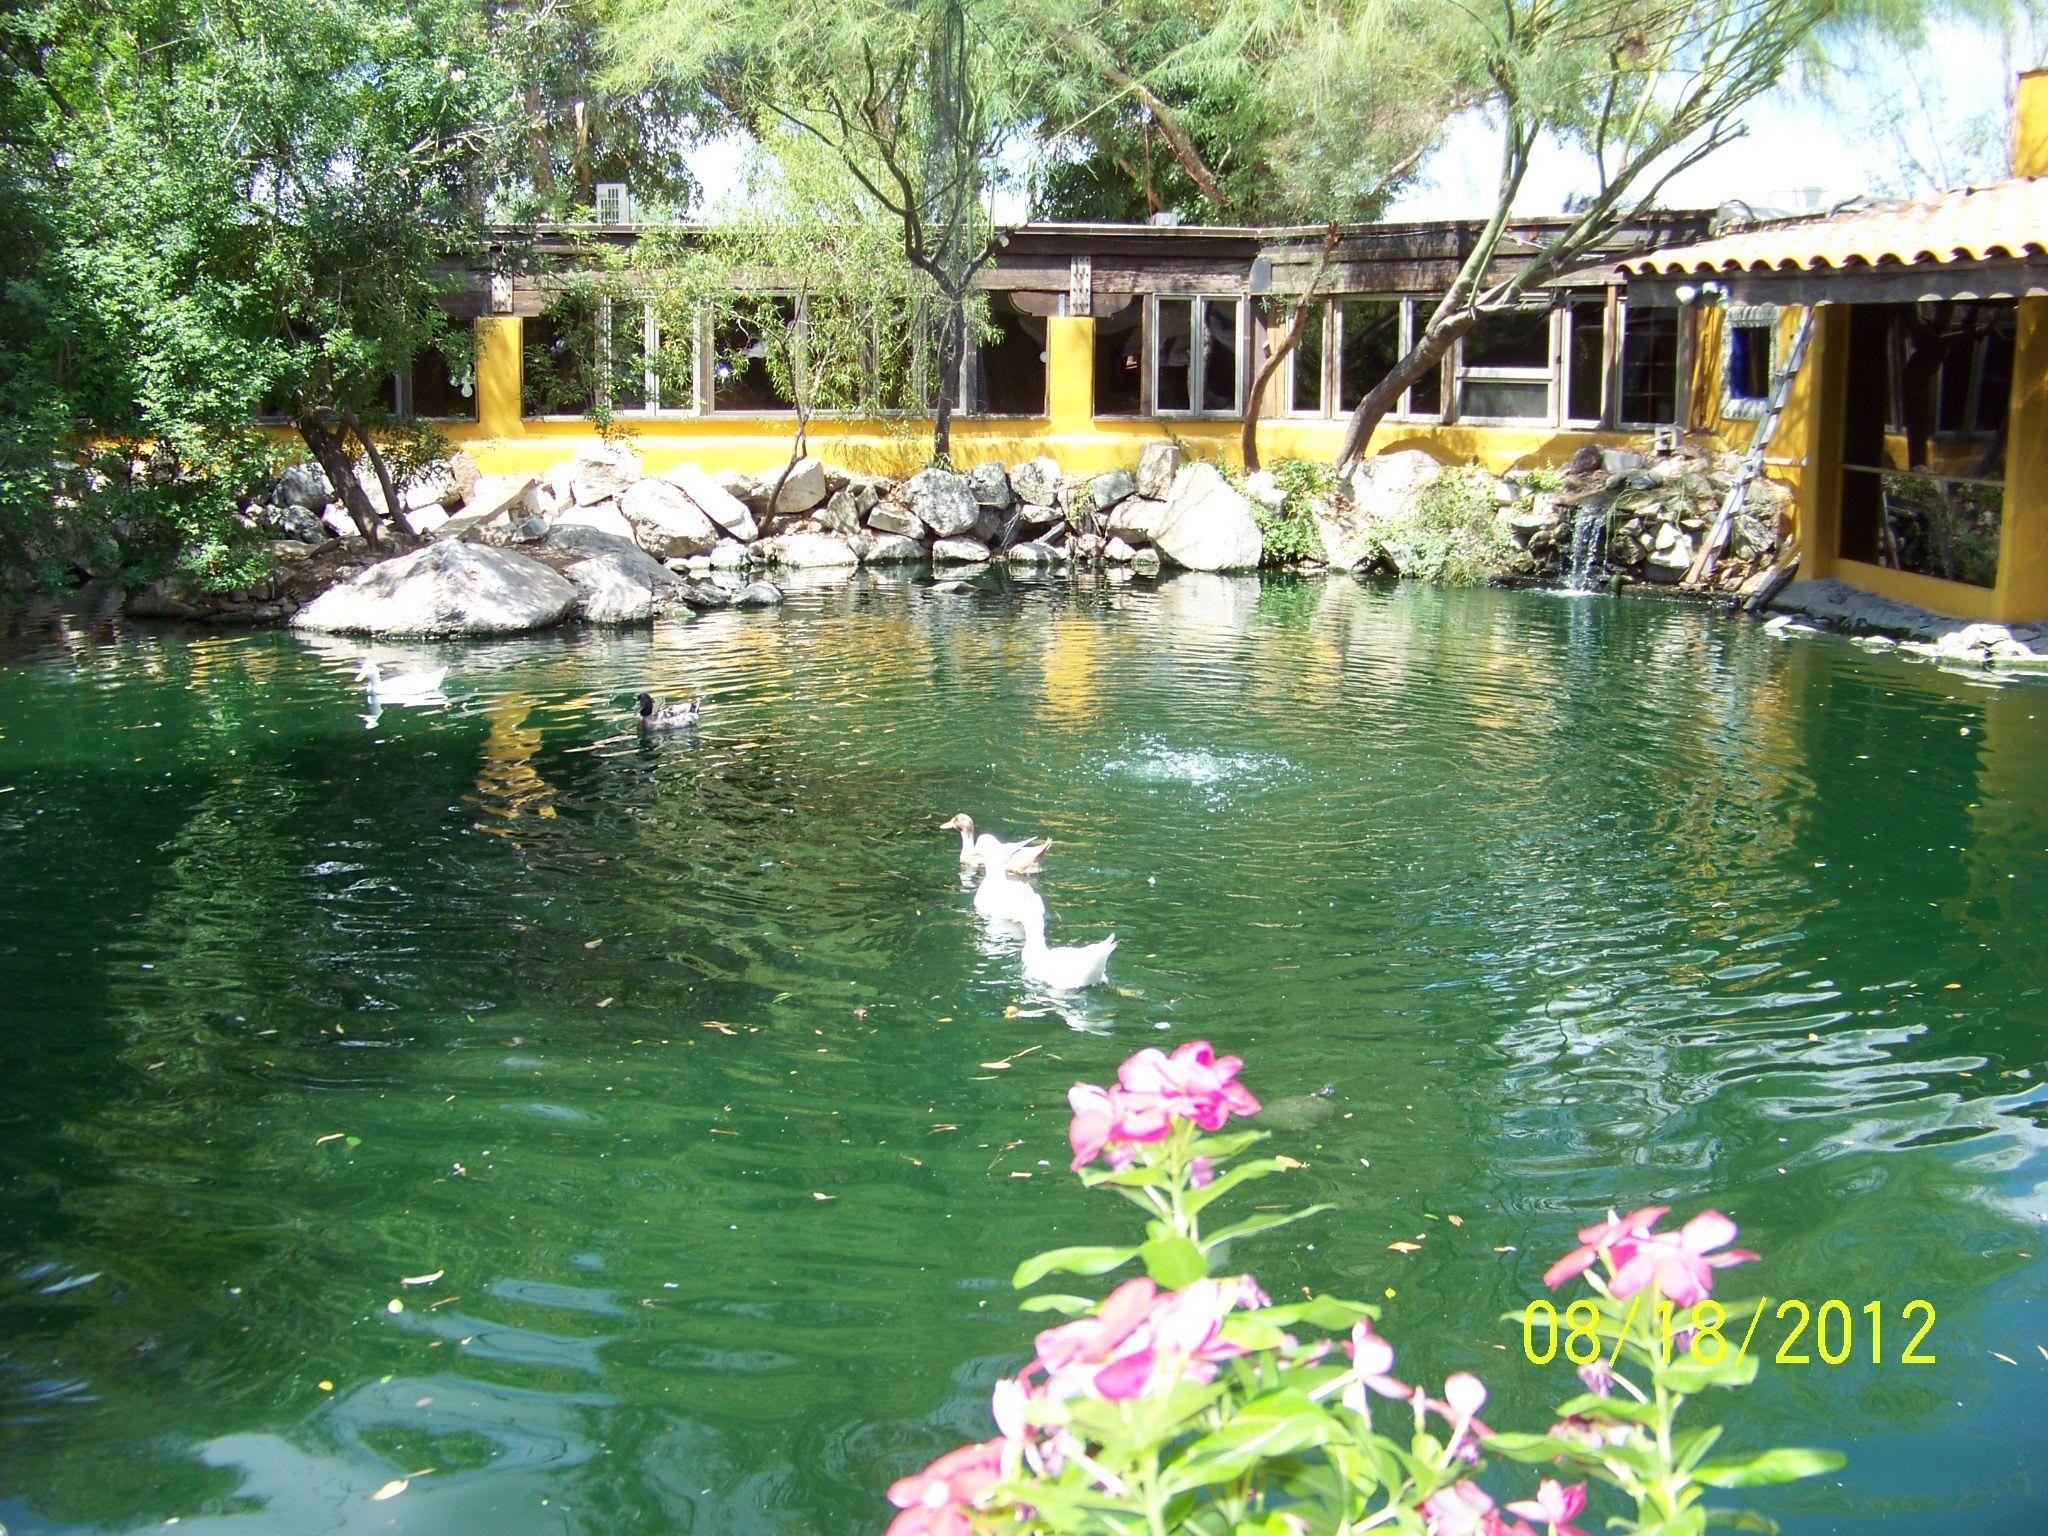 El EncantoCave Creek. A MUST for your bucket list. Great